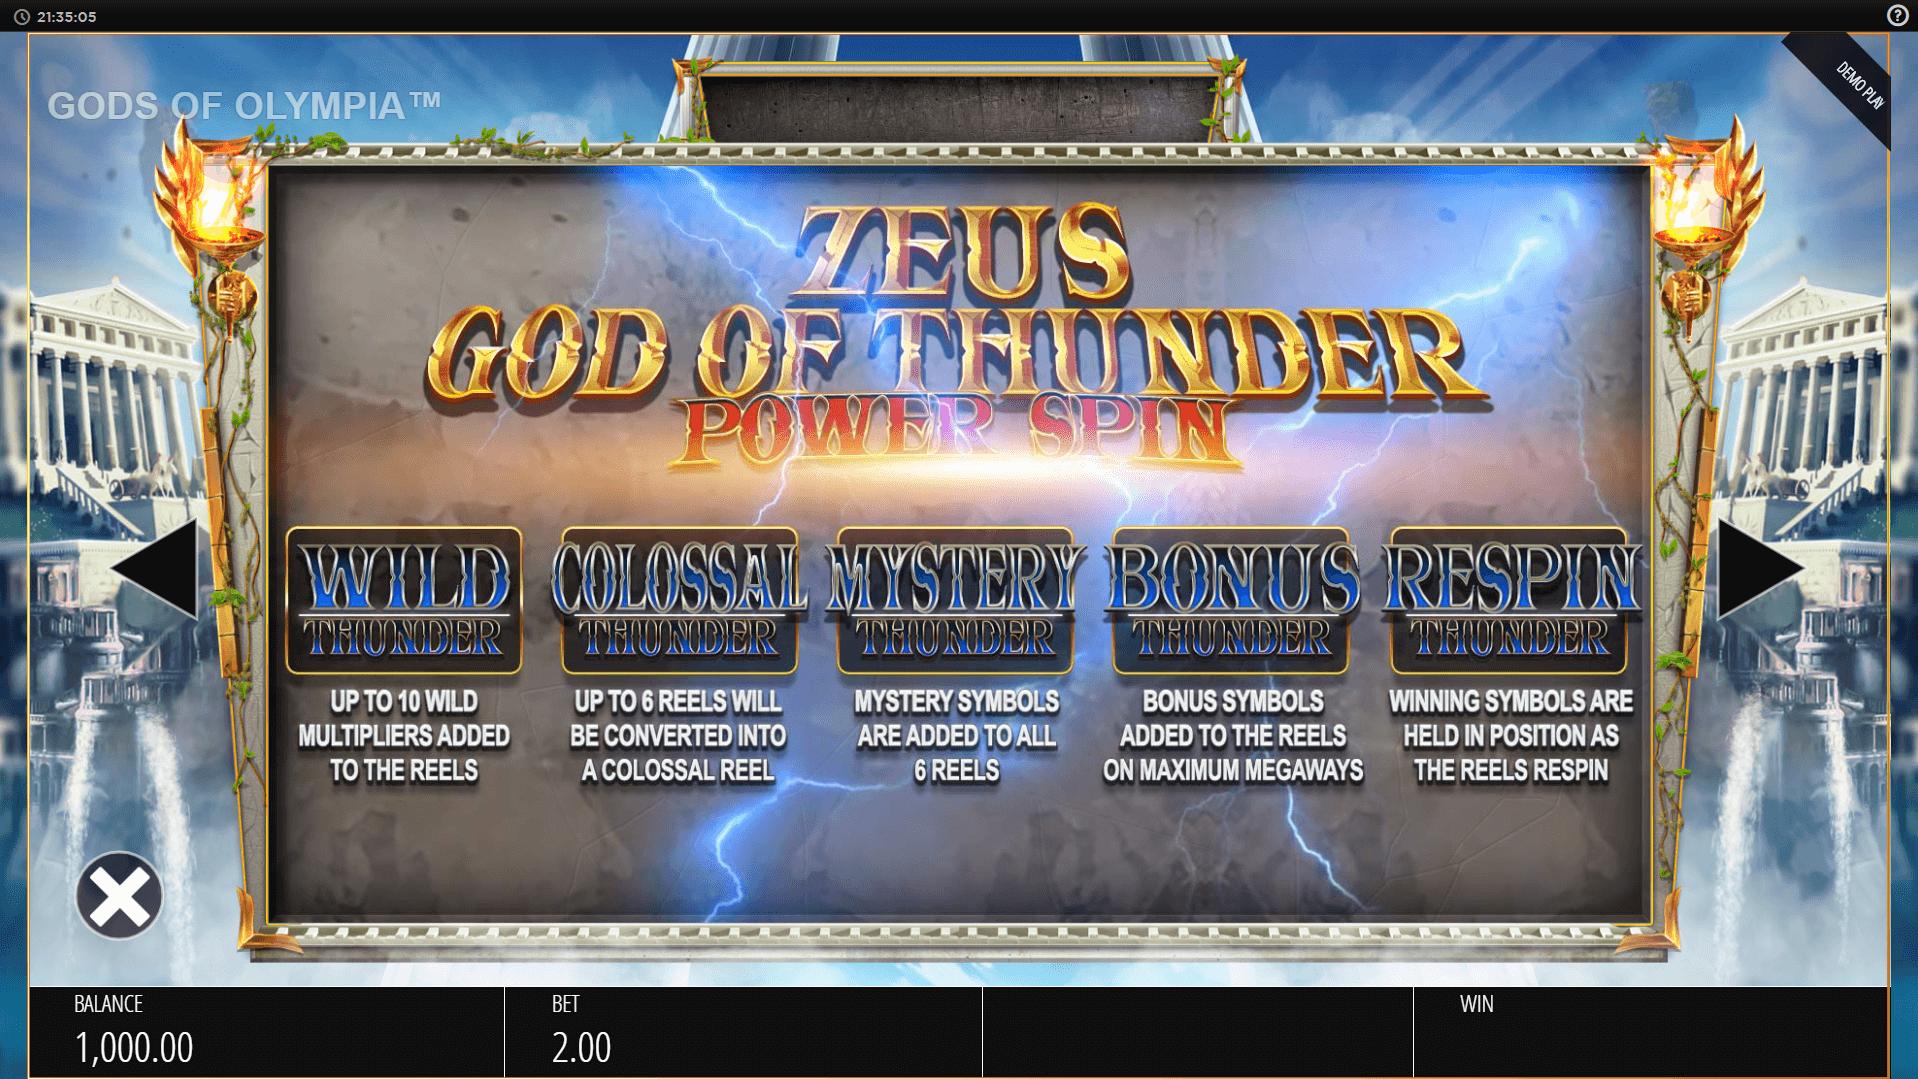 Gods of Olympus Megaways Slot Machine